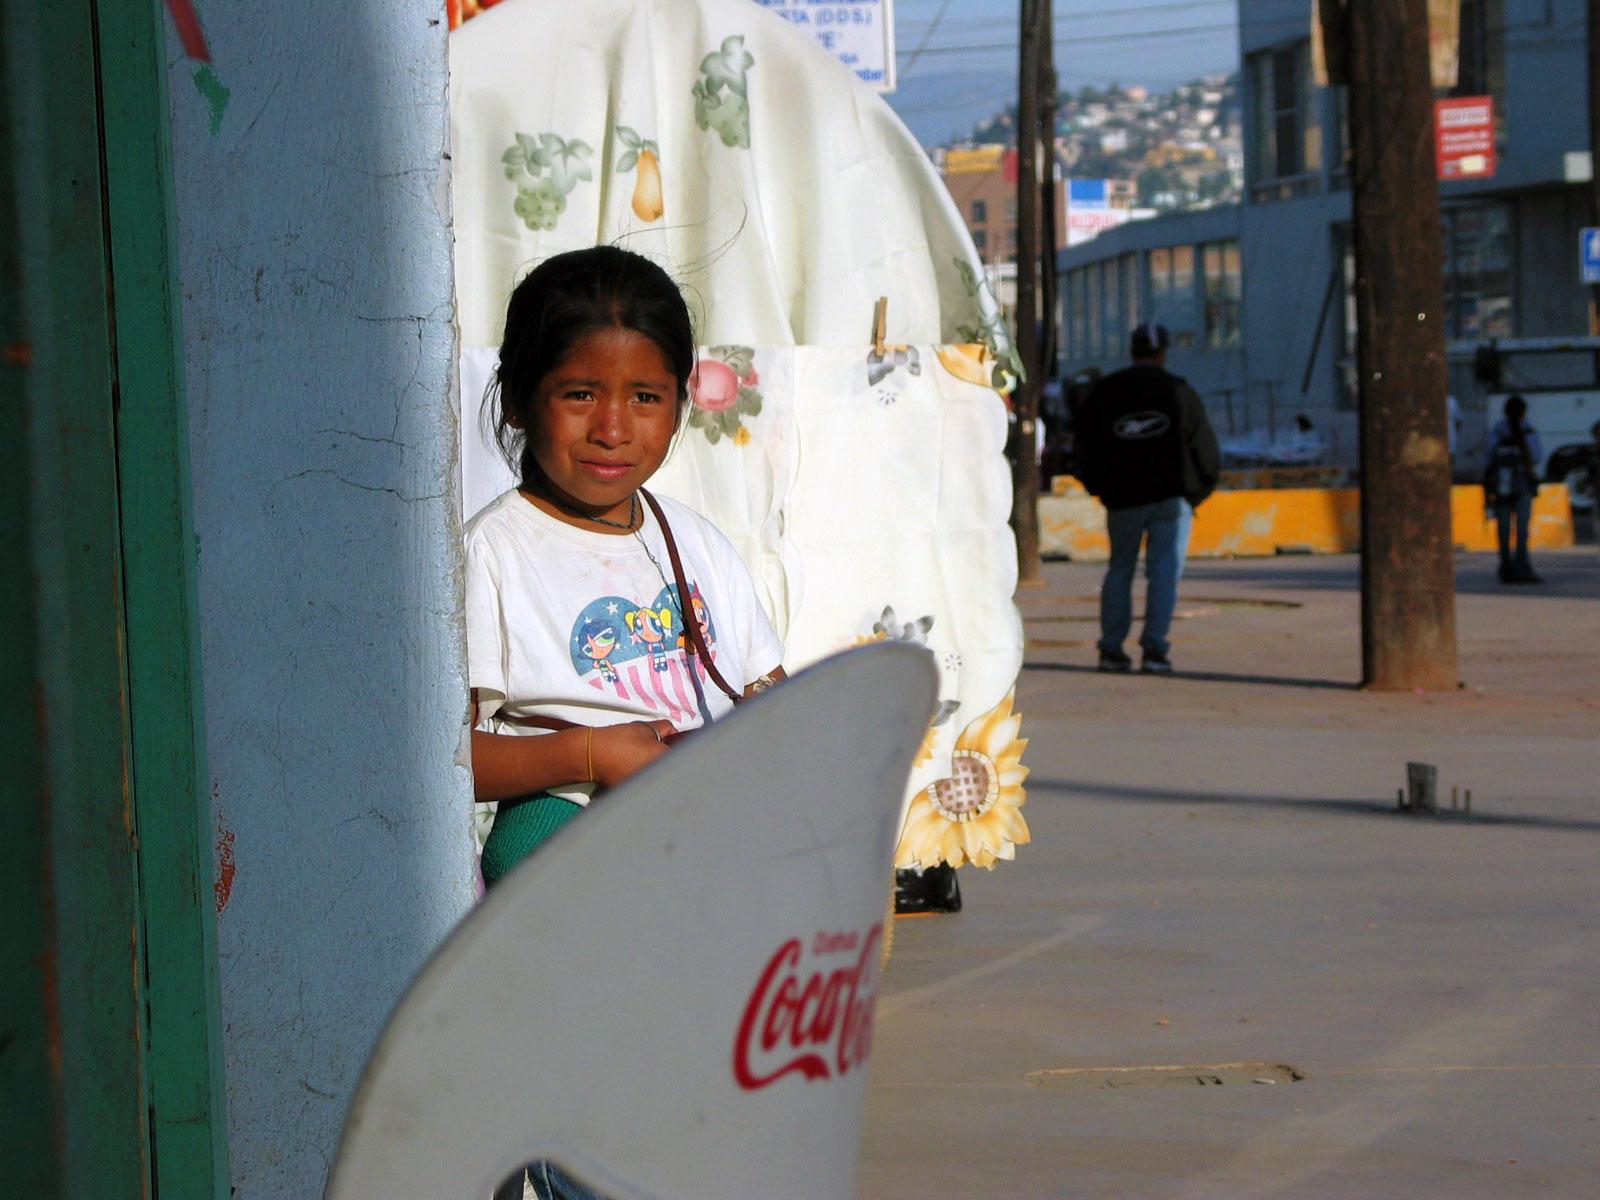 Tijuana Girl. Kuva: Miika Mattila